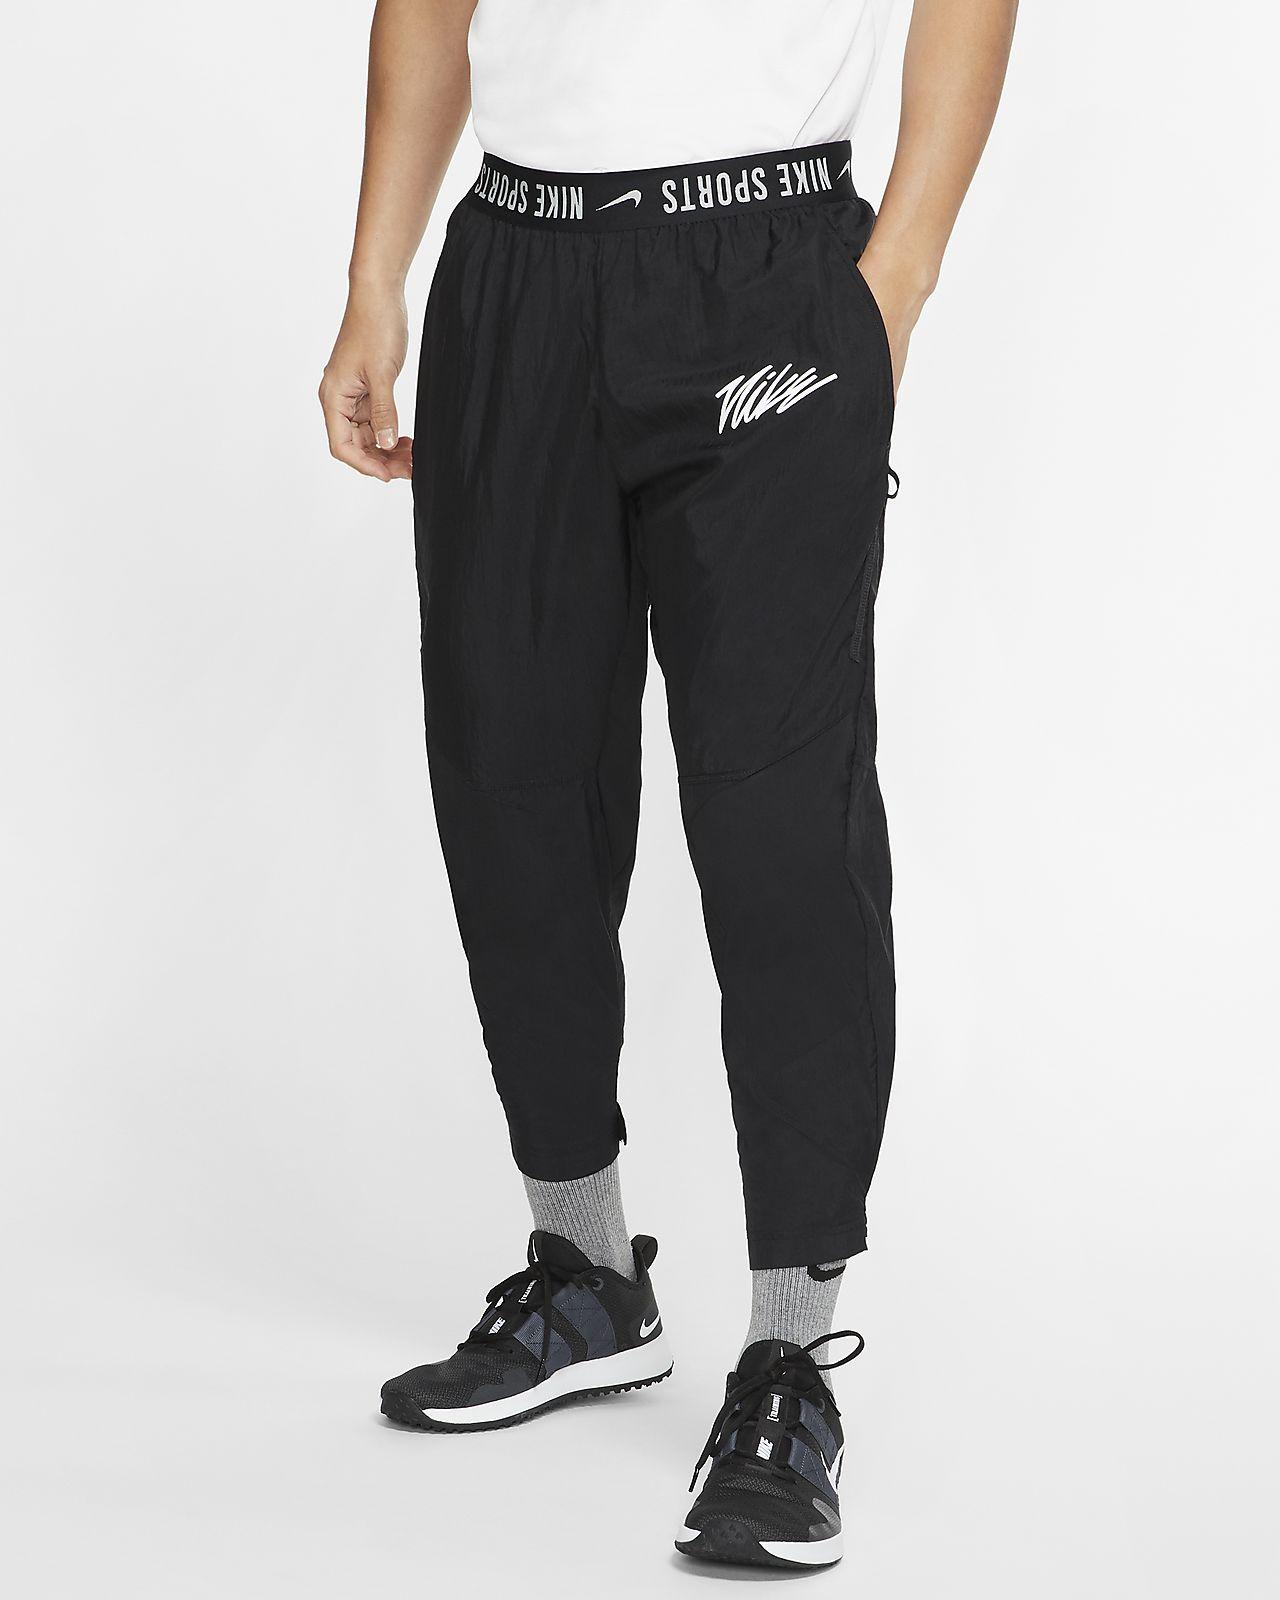 Nike Web-Trainingshose für Herren